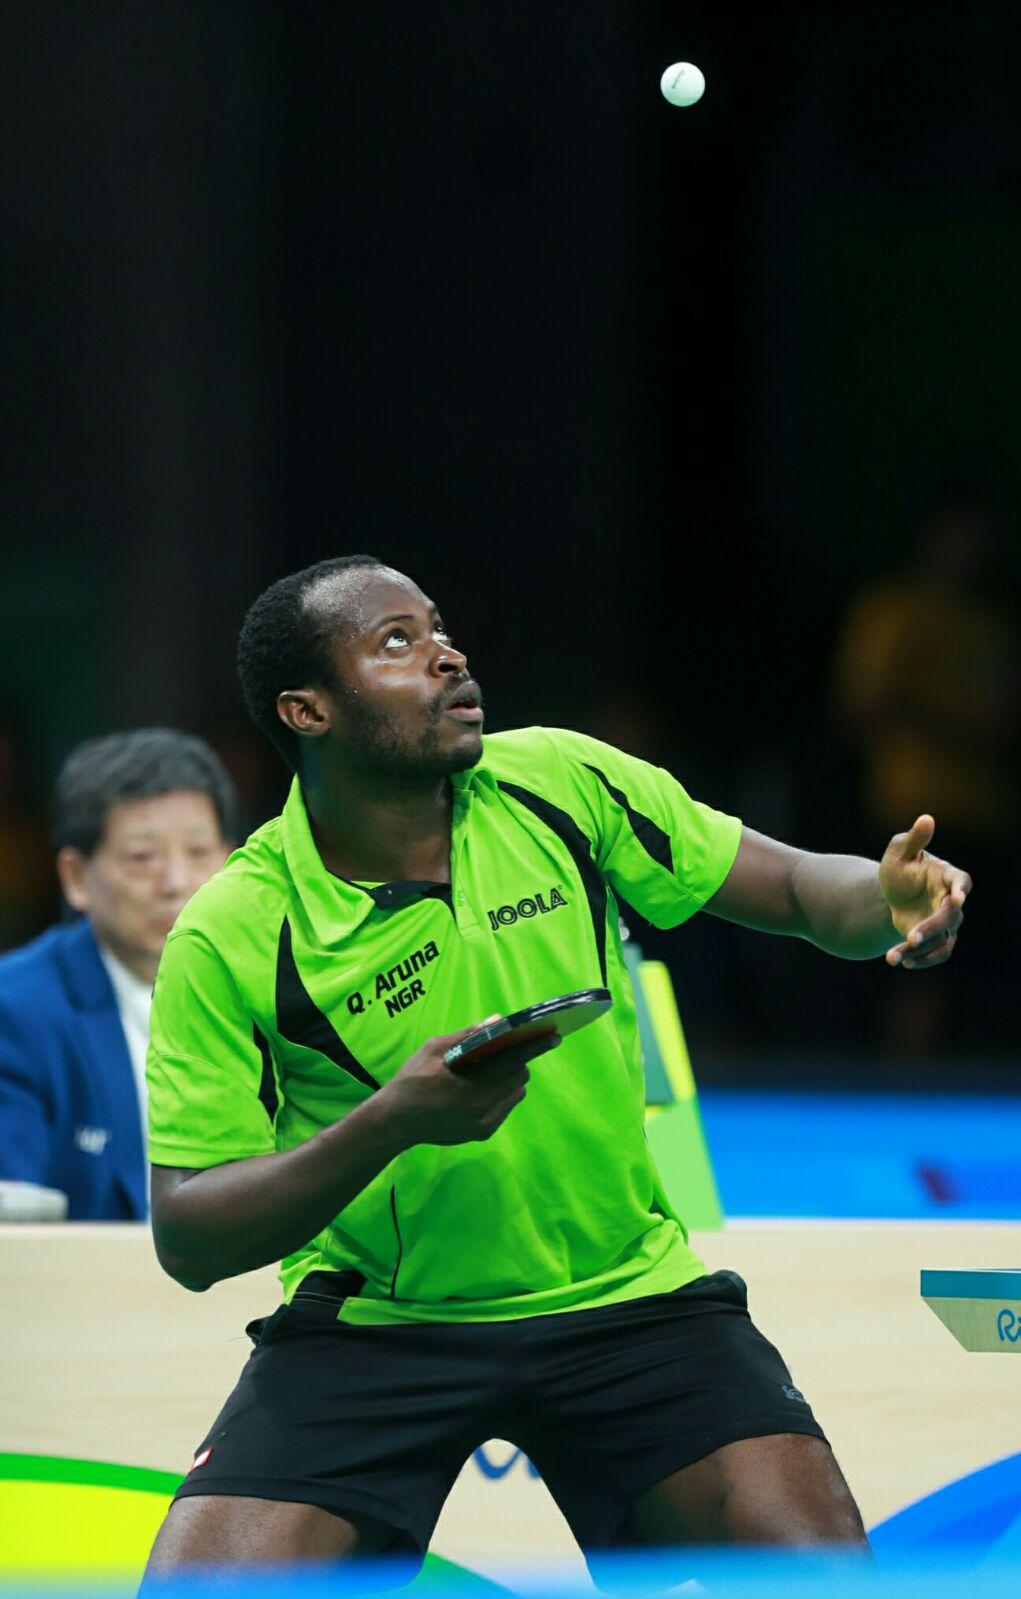 Table Tennis: ITTF Invites Quadri For 2016 Men's World Cup